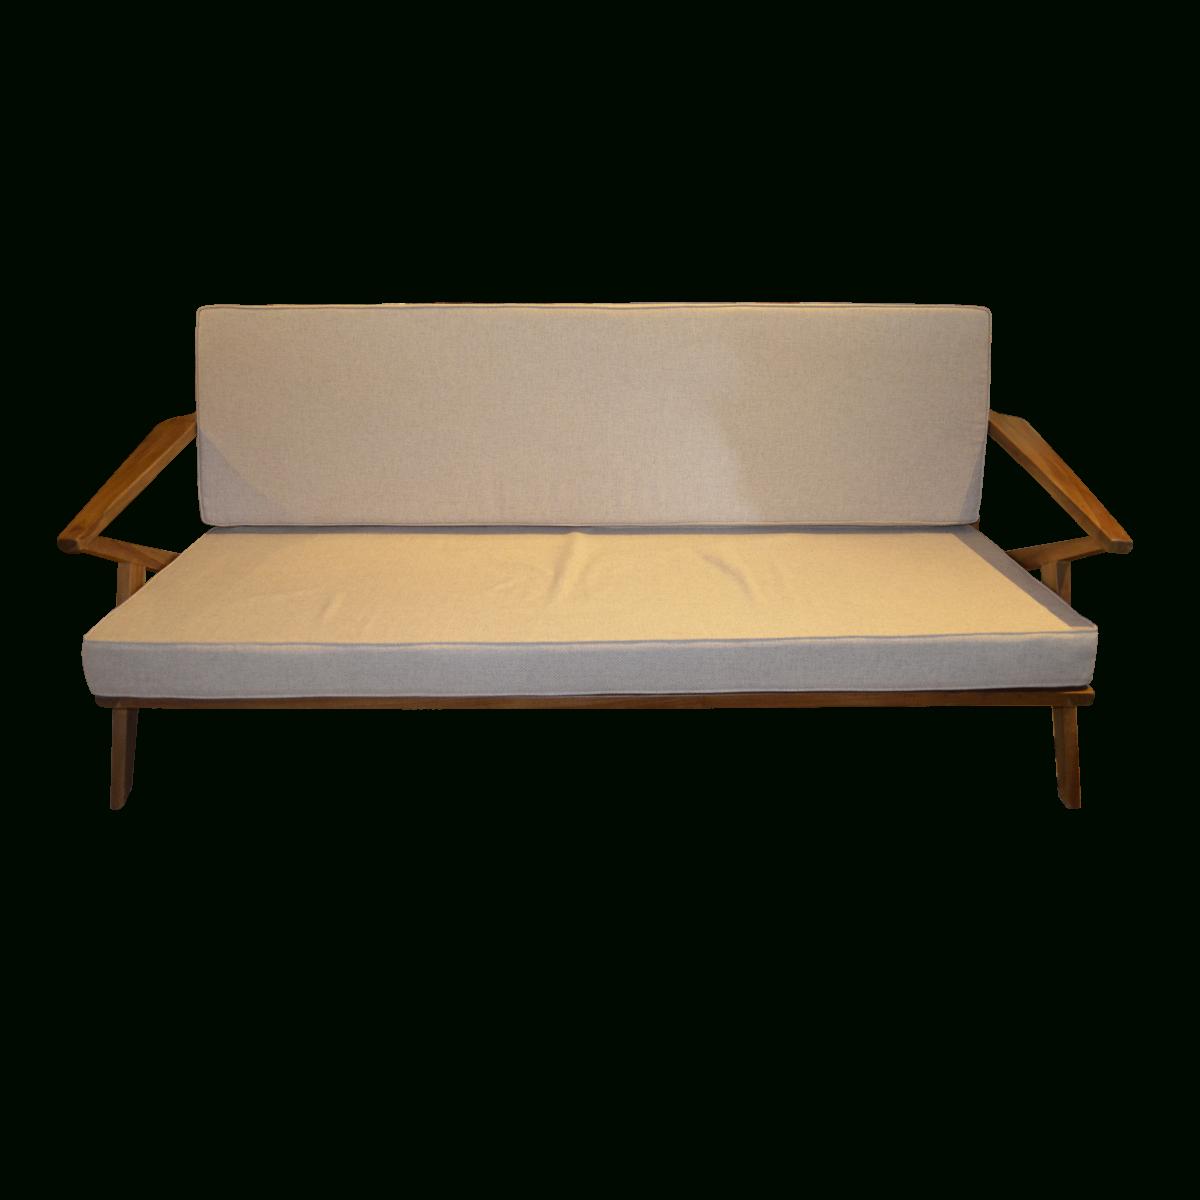 Sofa 160 – Teak Scandinavian | Furniture & Home Décor | Fortytwo Throughout Quinn Teak Sofa Chairs (Image 21 of 25)